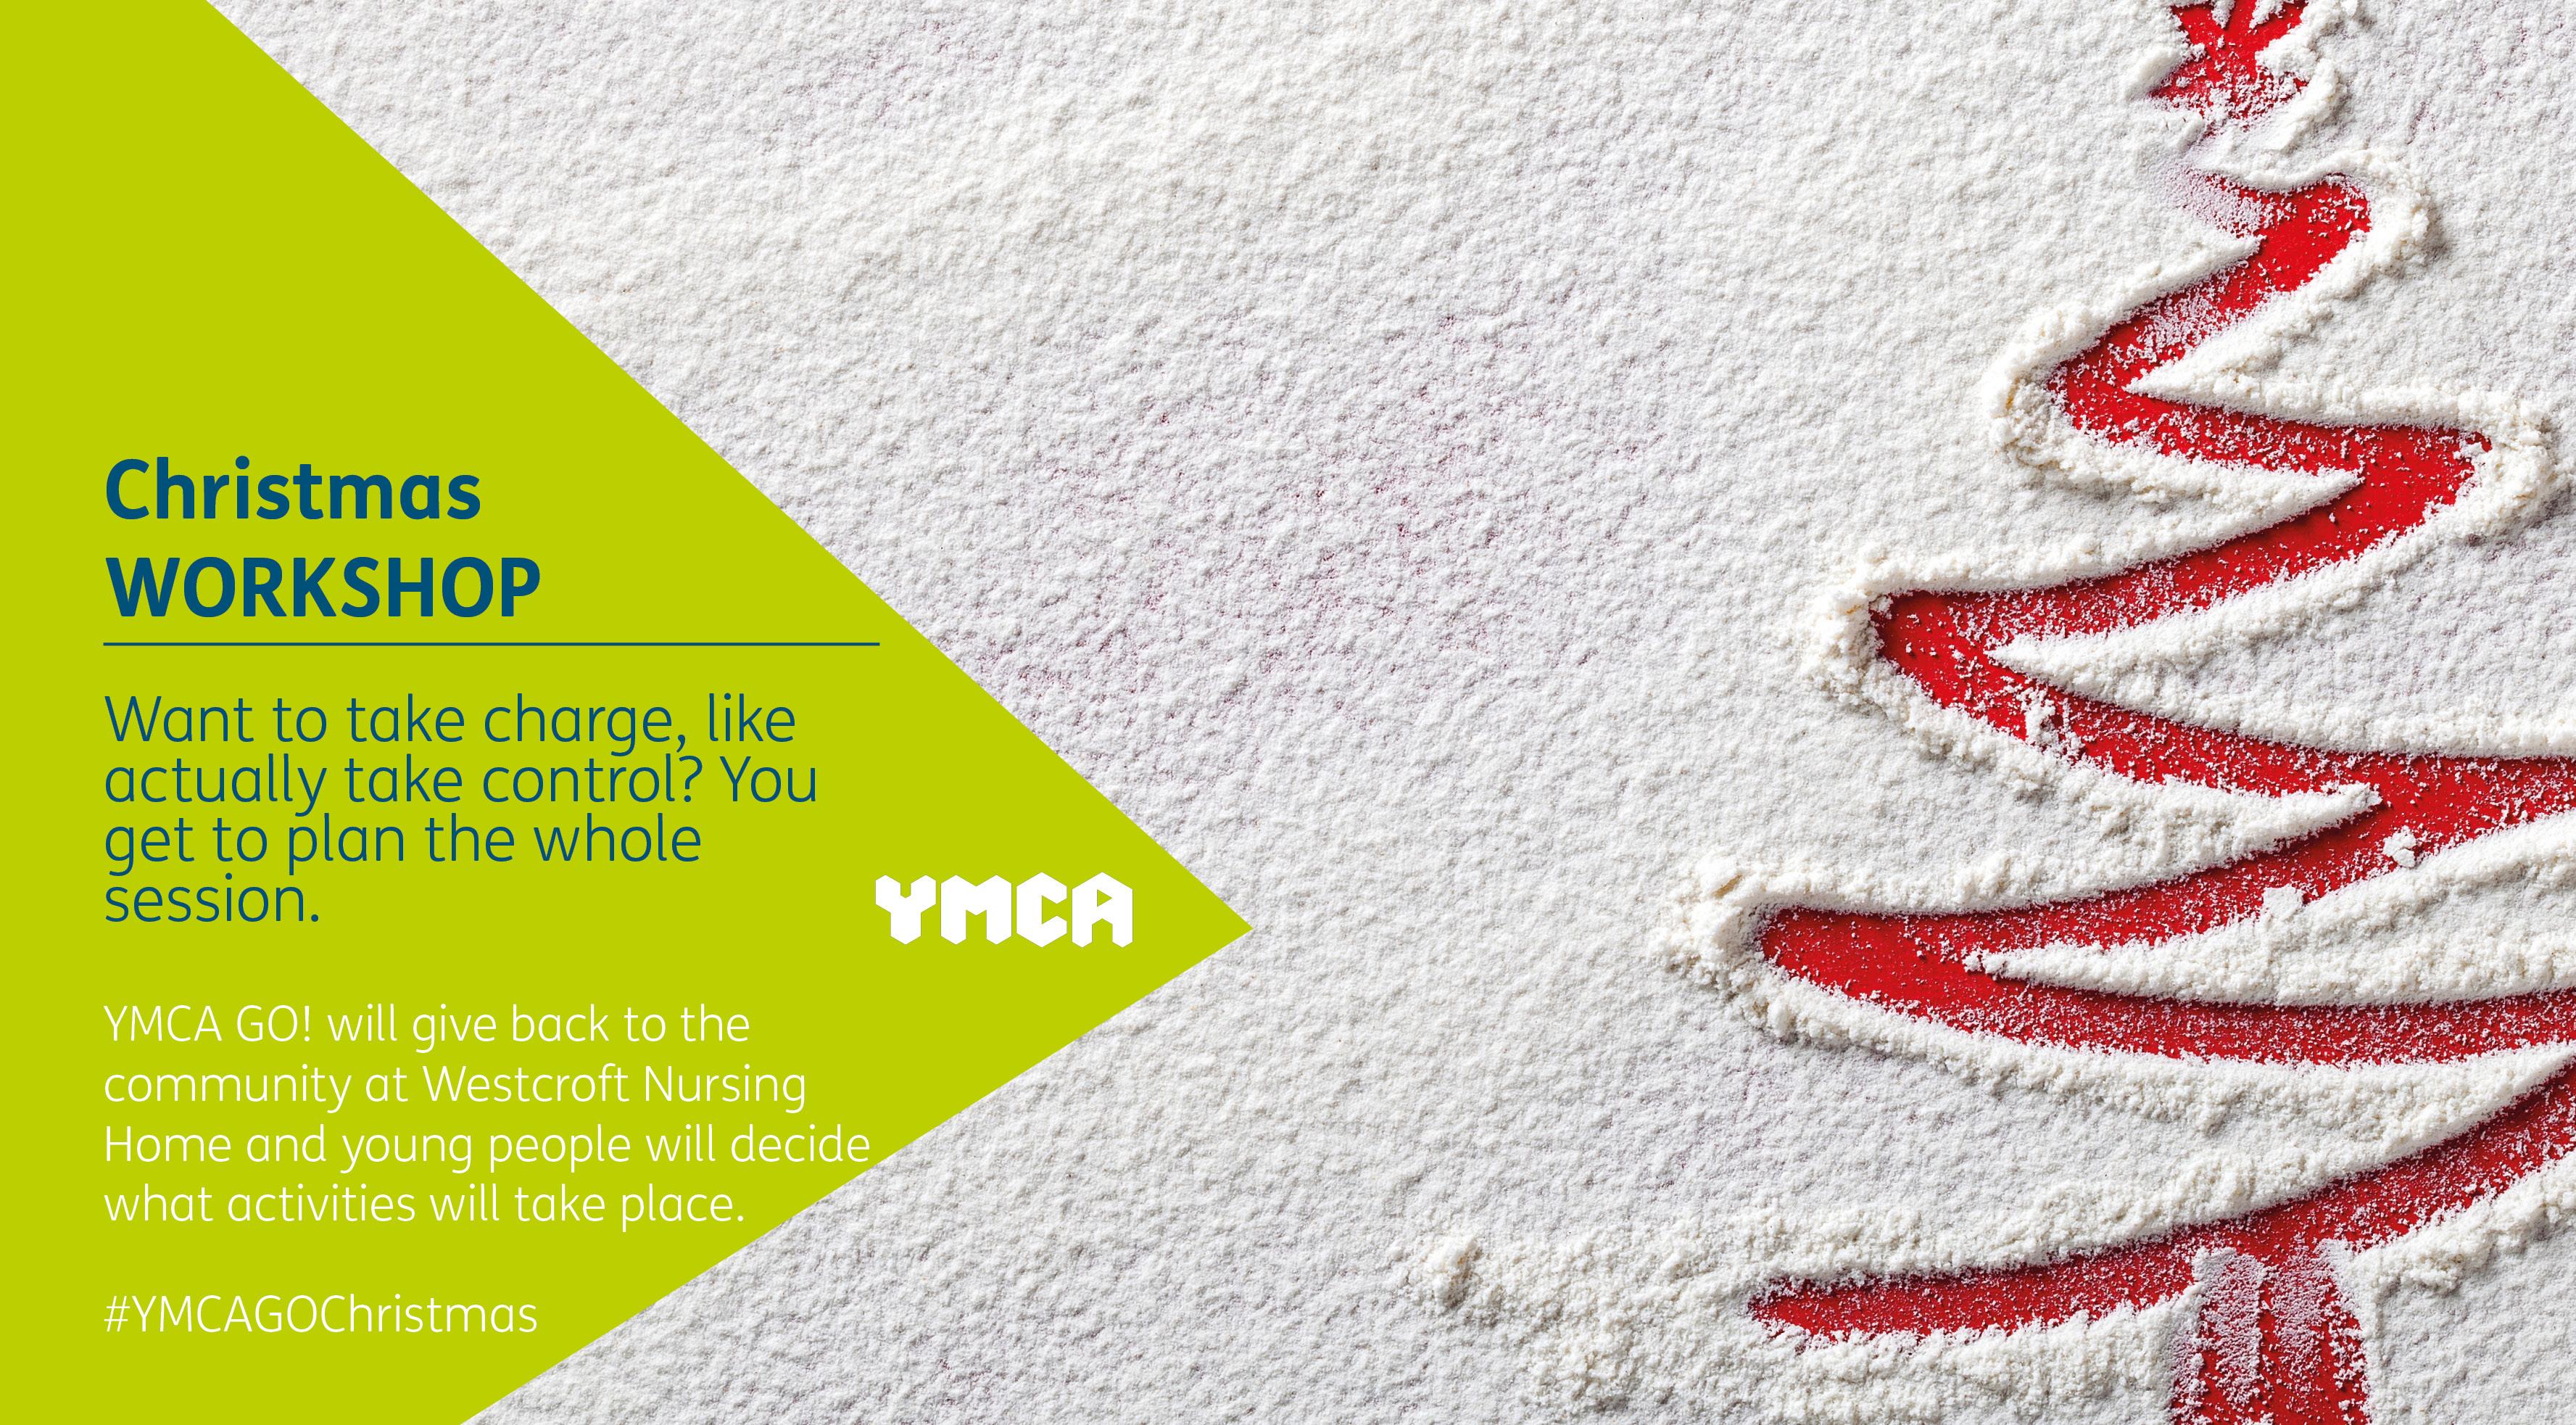 YMCA GO! 12 Days of Christmas | YMCA North Staffordshire